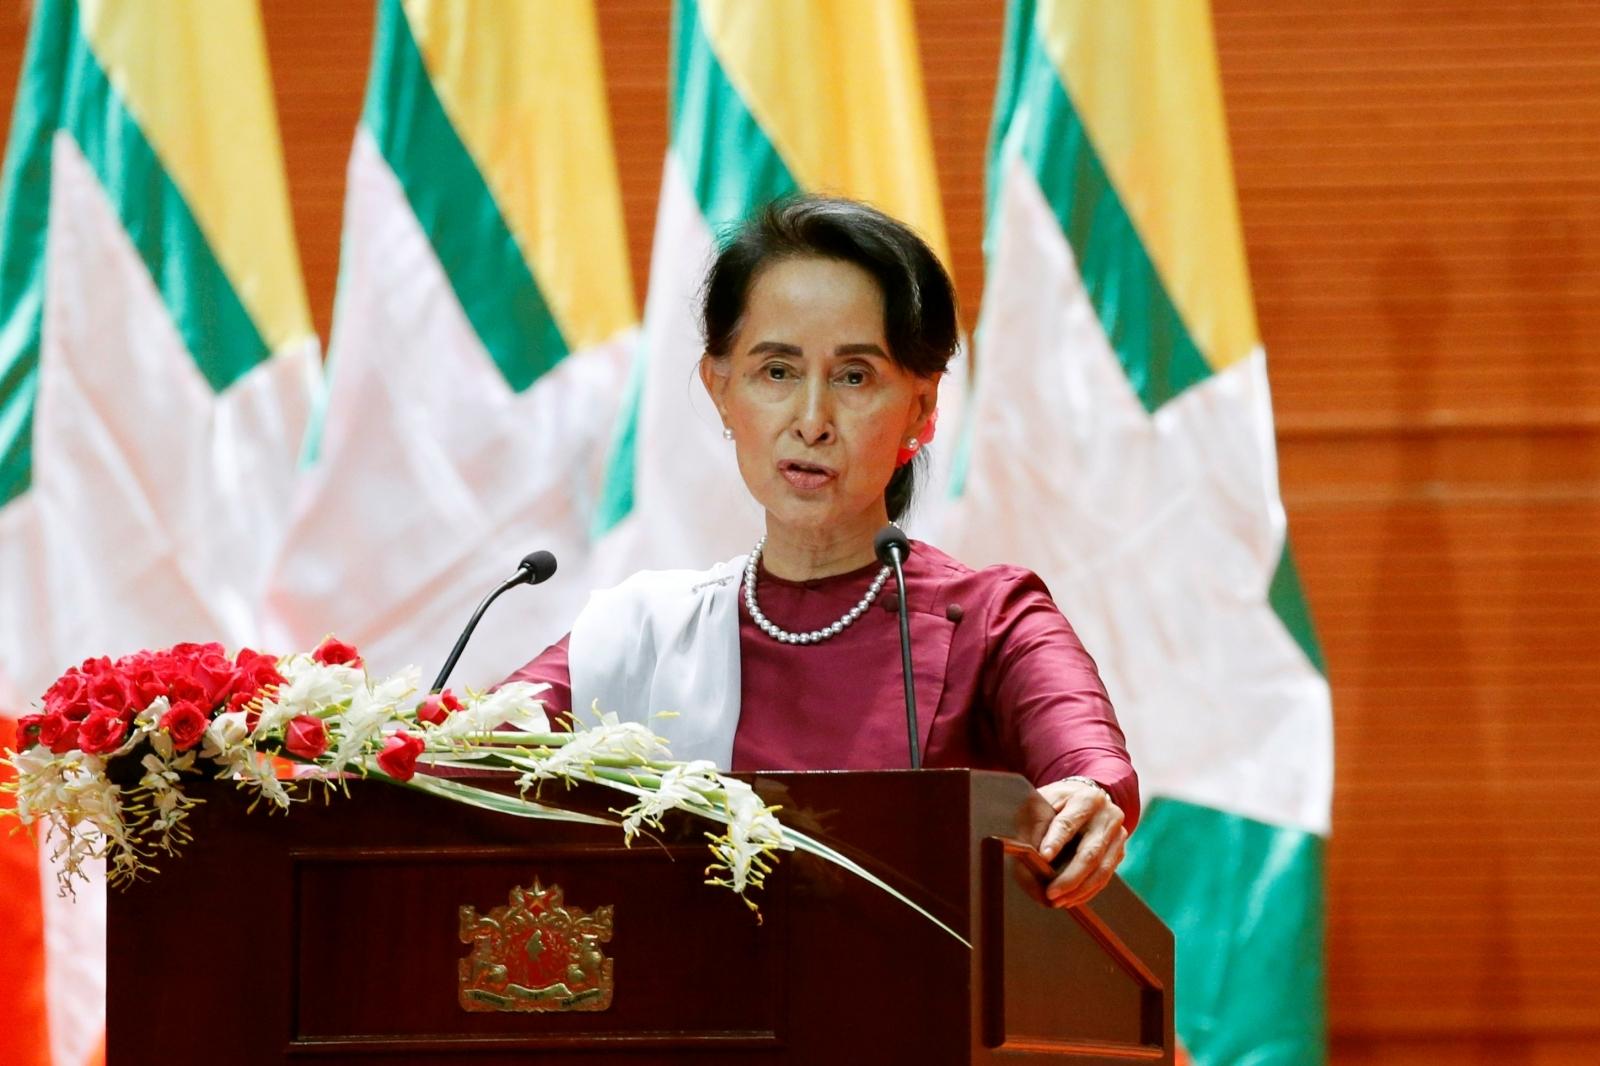 Myanmar State Counselor Aung San Suu Kyi